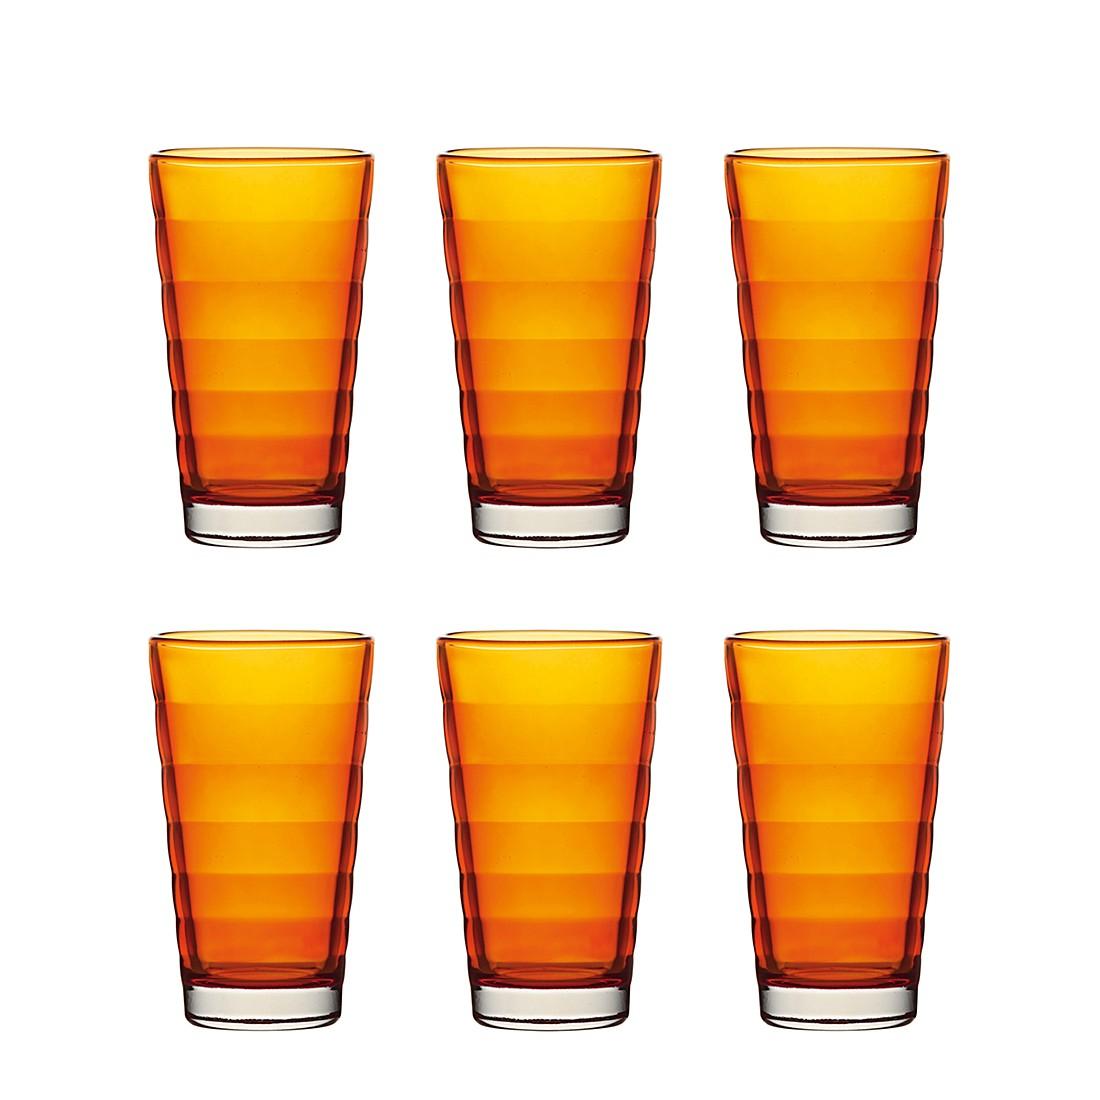 Becher Wave (6er-Set) – Groß – Orange, Leonardo bestellen